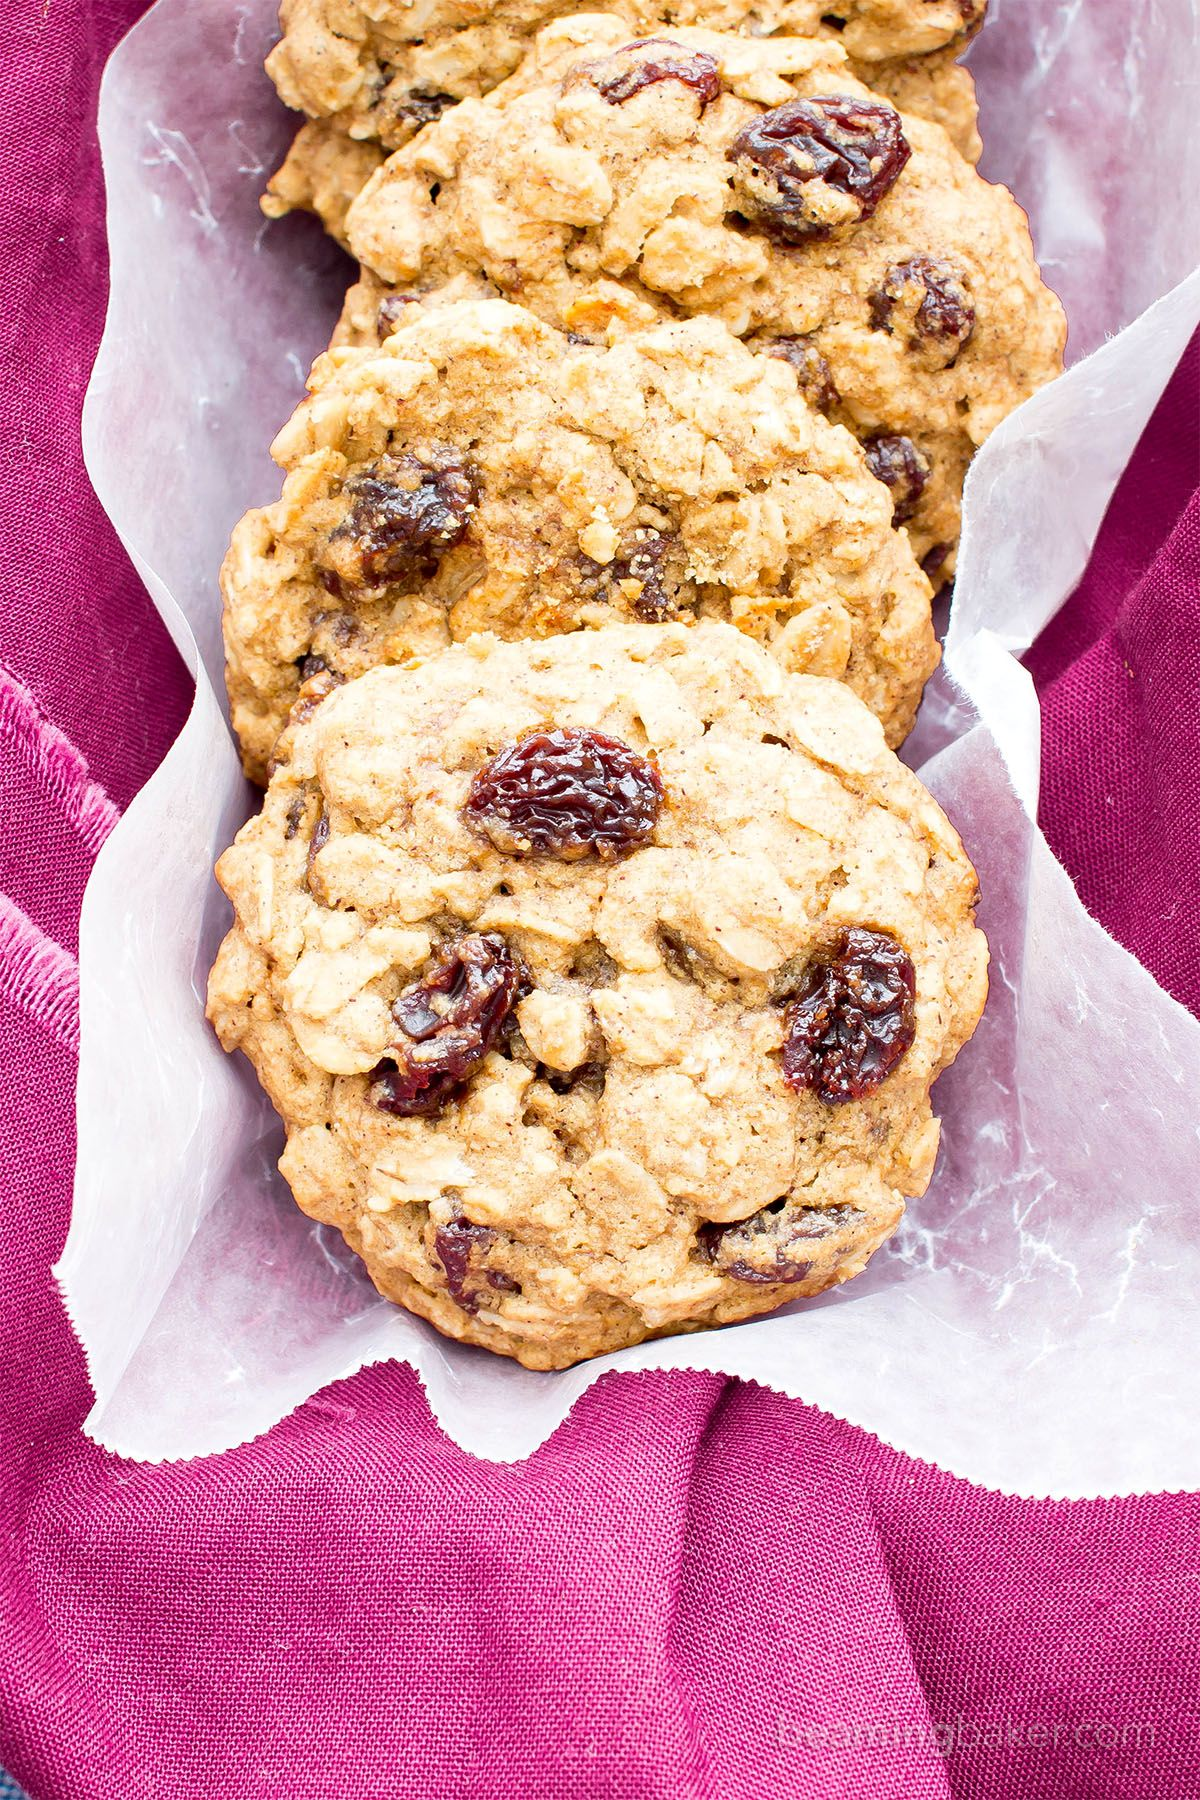 Easy gluten free vegan oatmeal raisin cookies v gf df